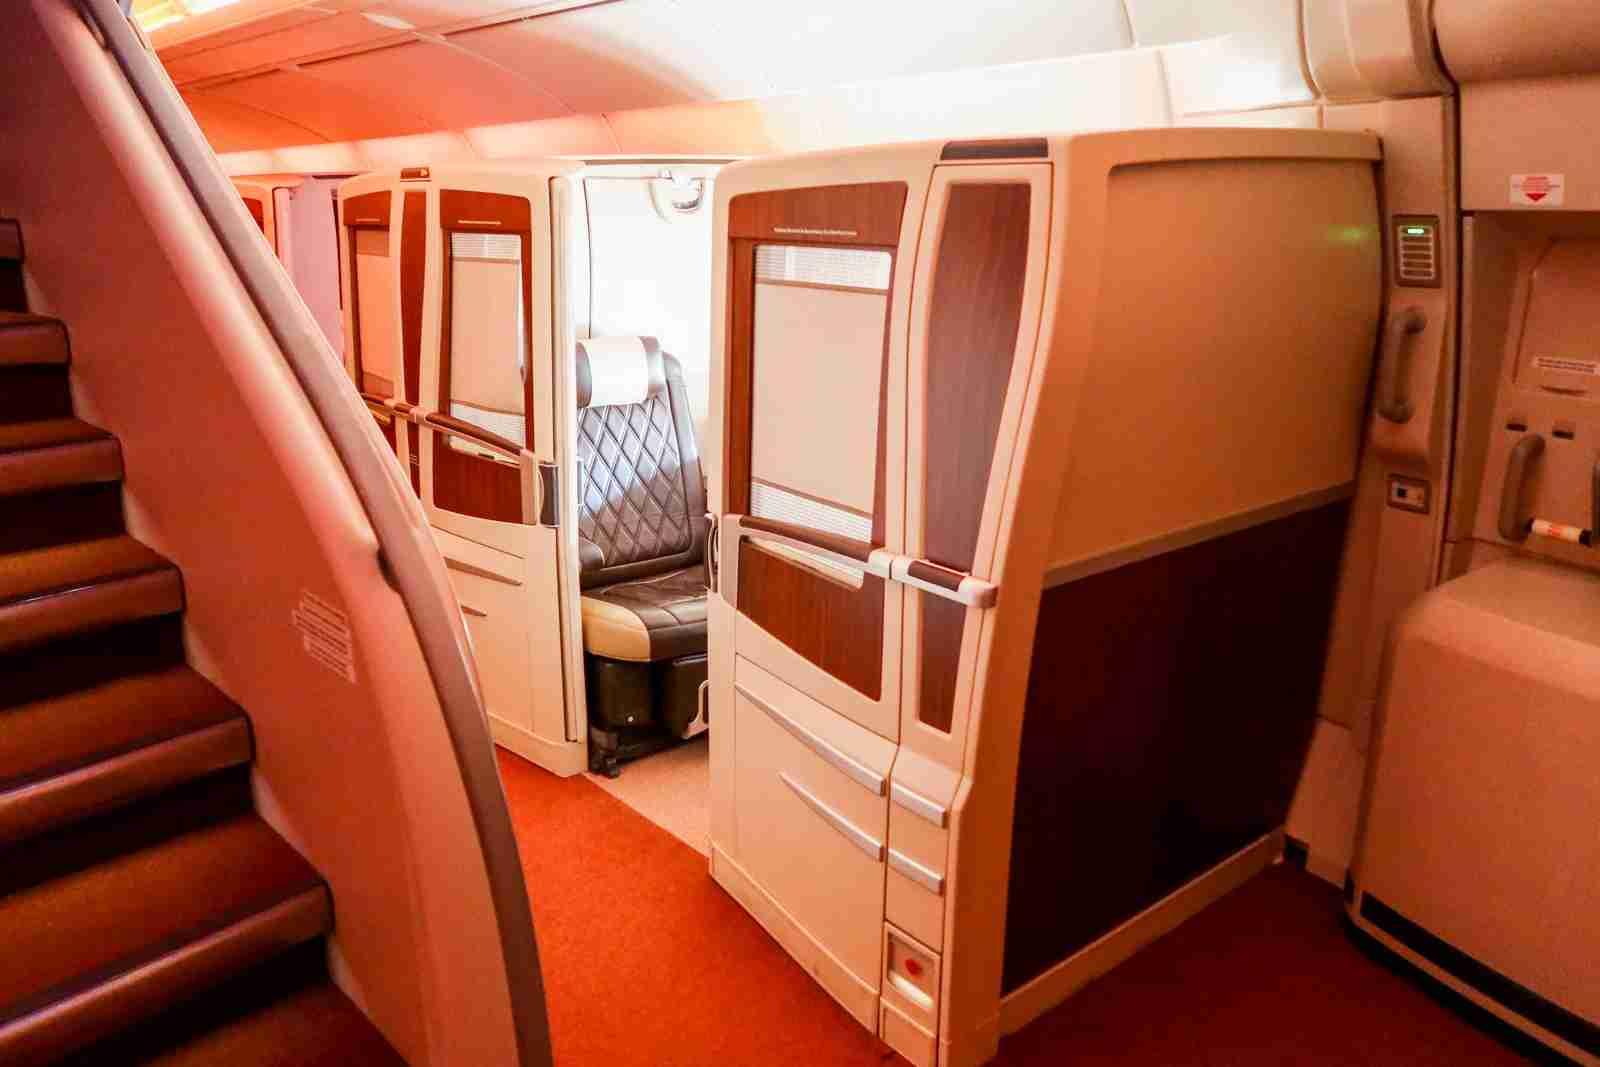 Singapore Suites on Singapore Airlines